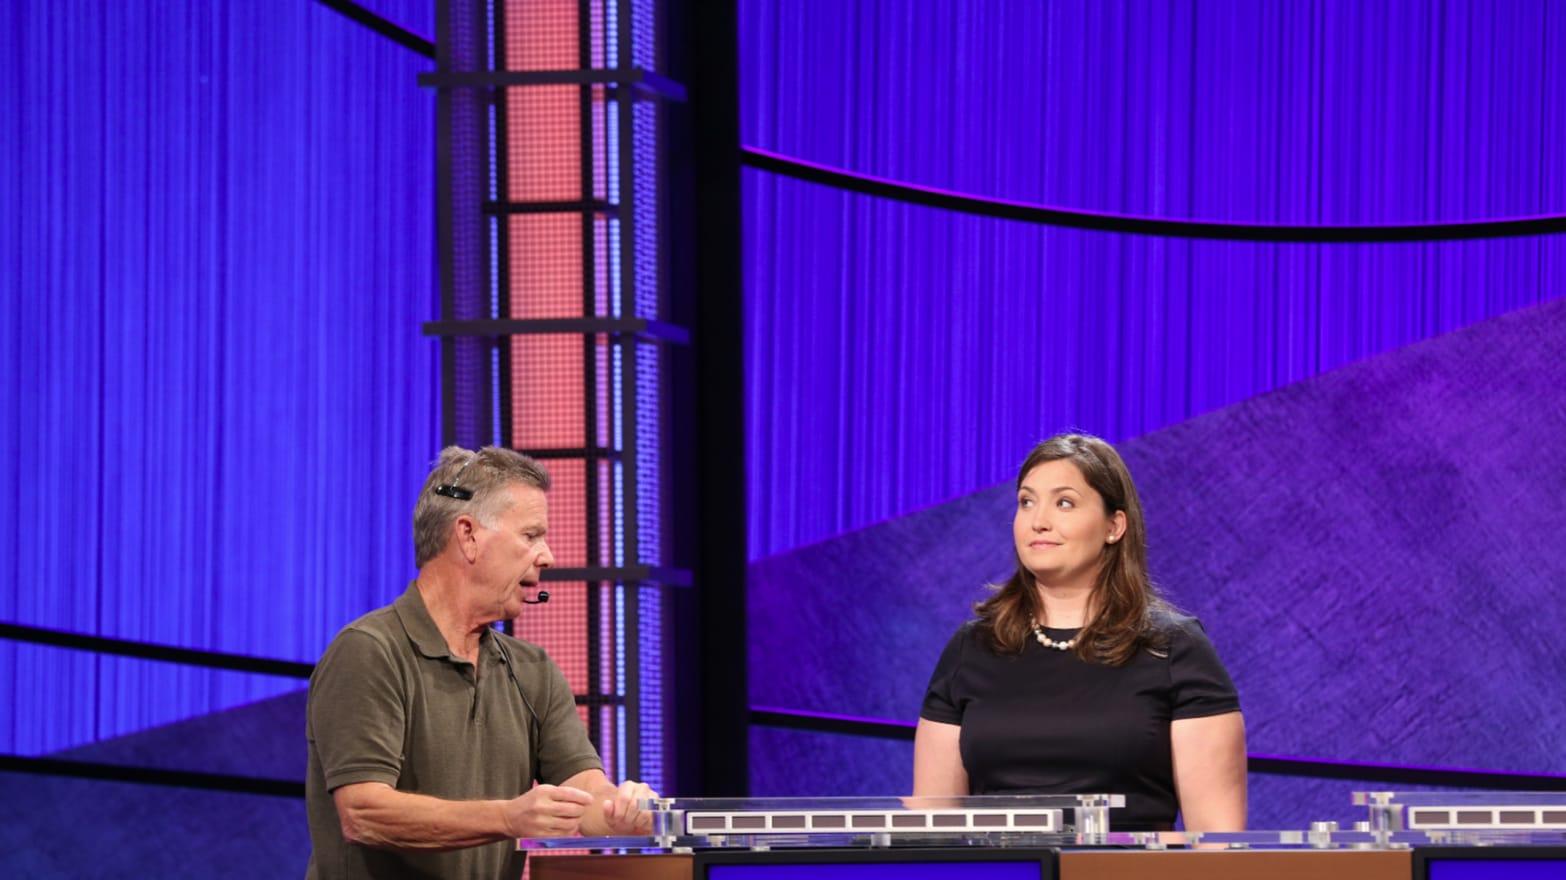 Jeopardy! Champion Julia Collins's Brain Feels Like Mush